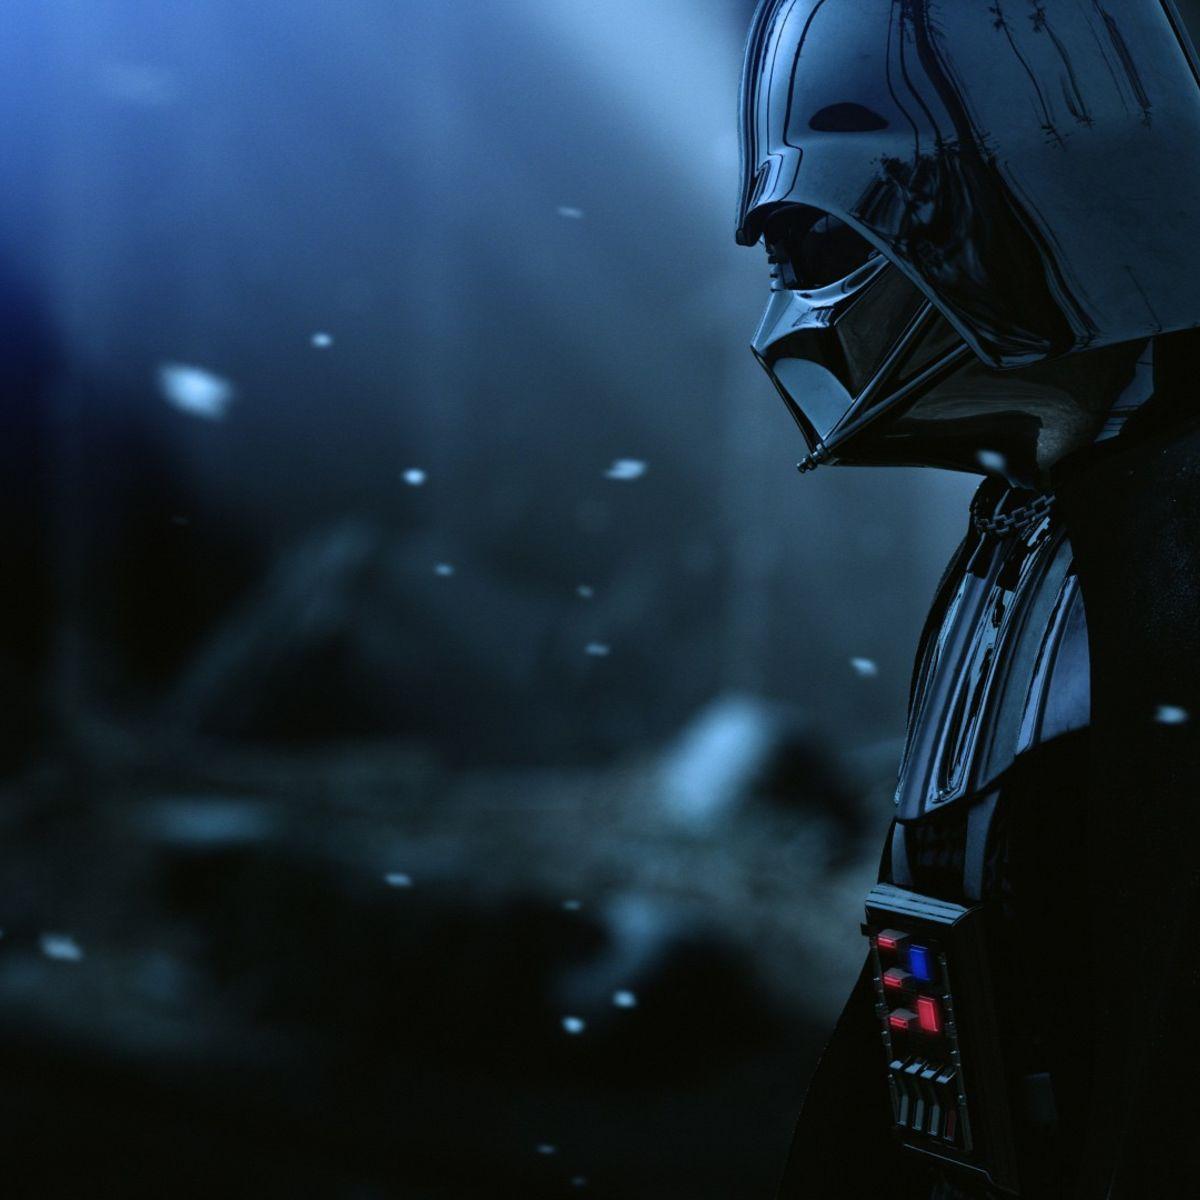 star-wars-wallpaper-4.jpg